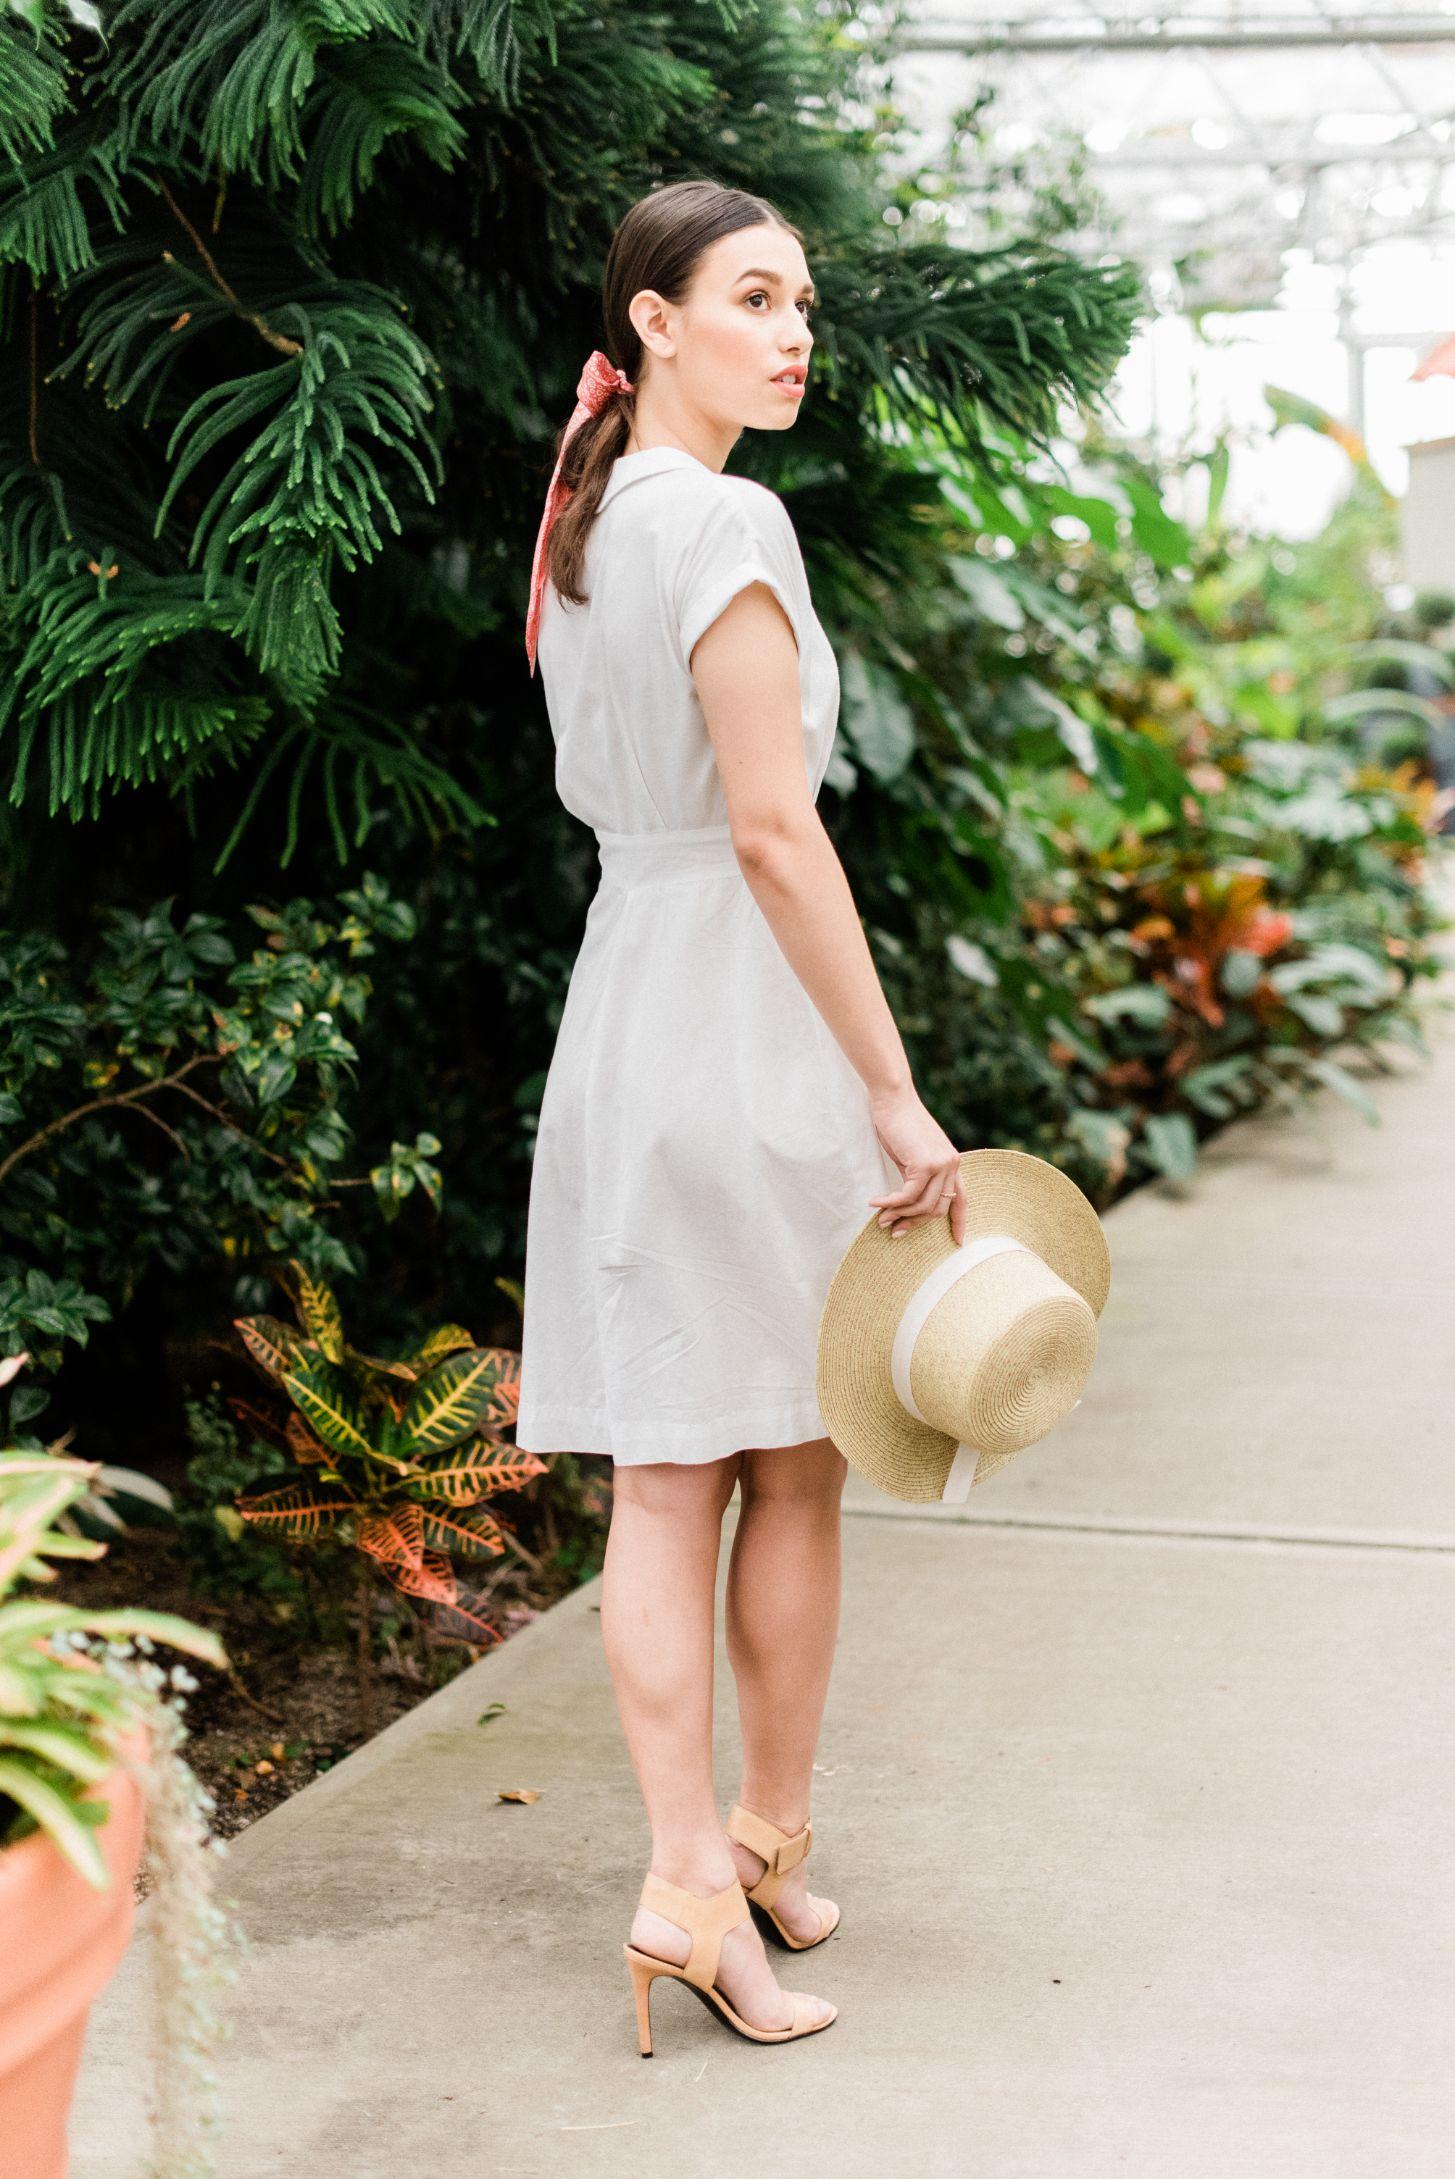 roger-williams-park-botanical-tropical-peach-daylynn-designs01.jpg